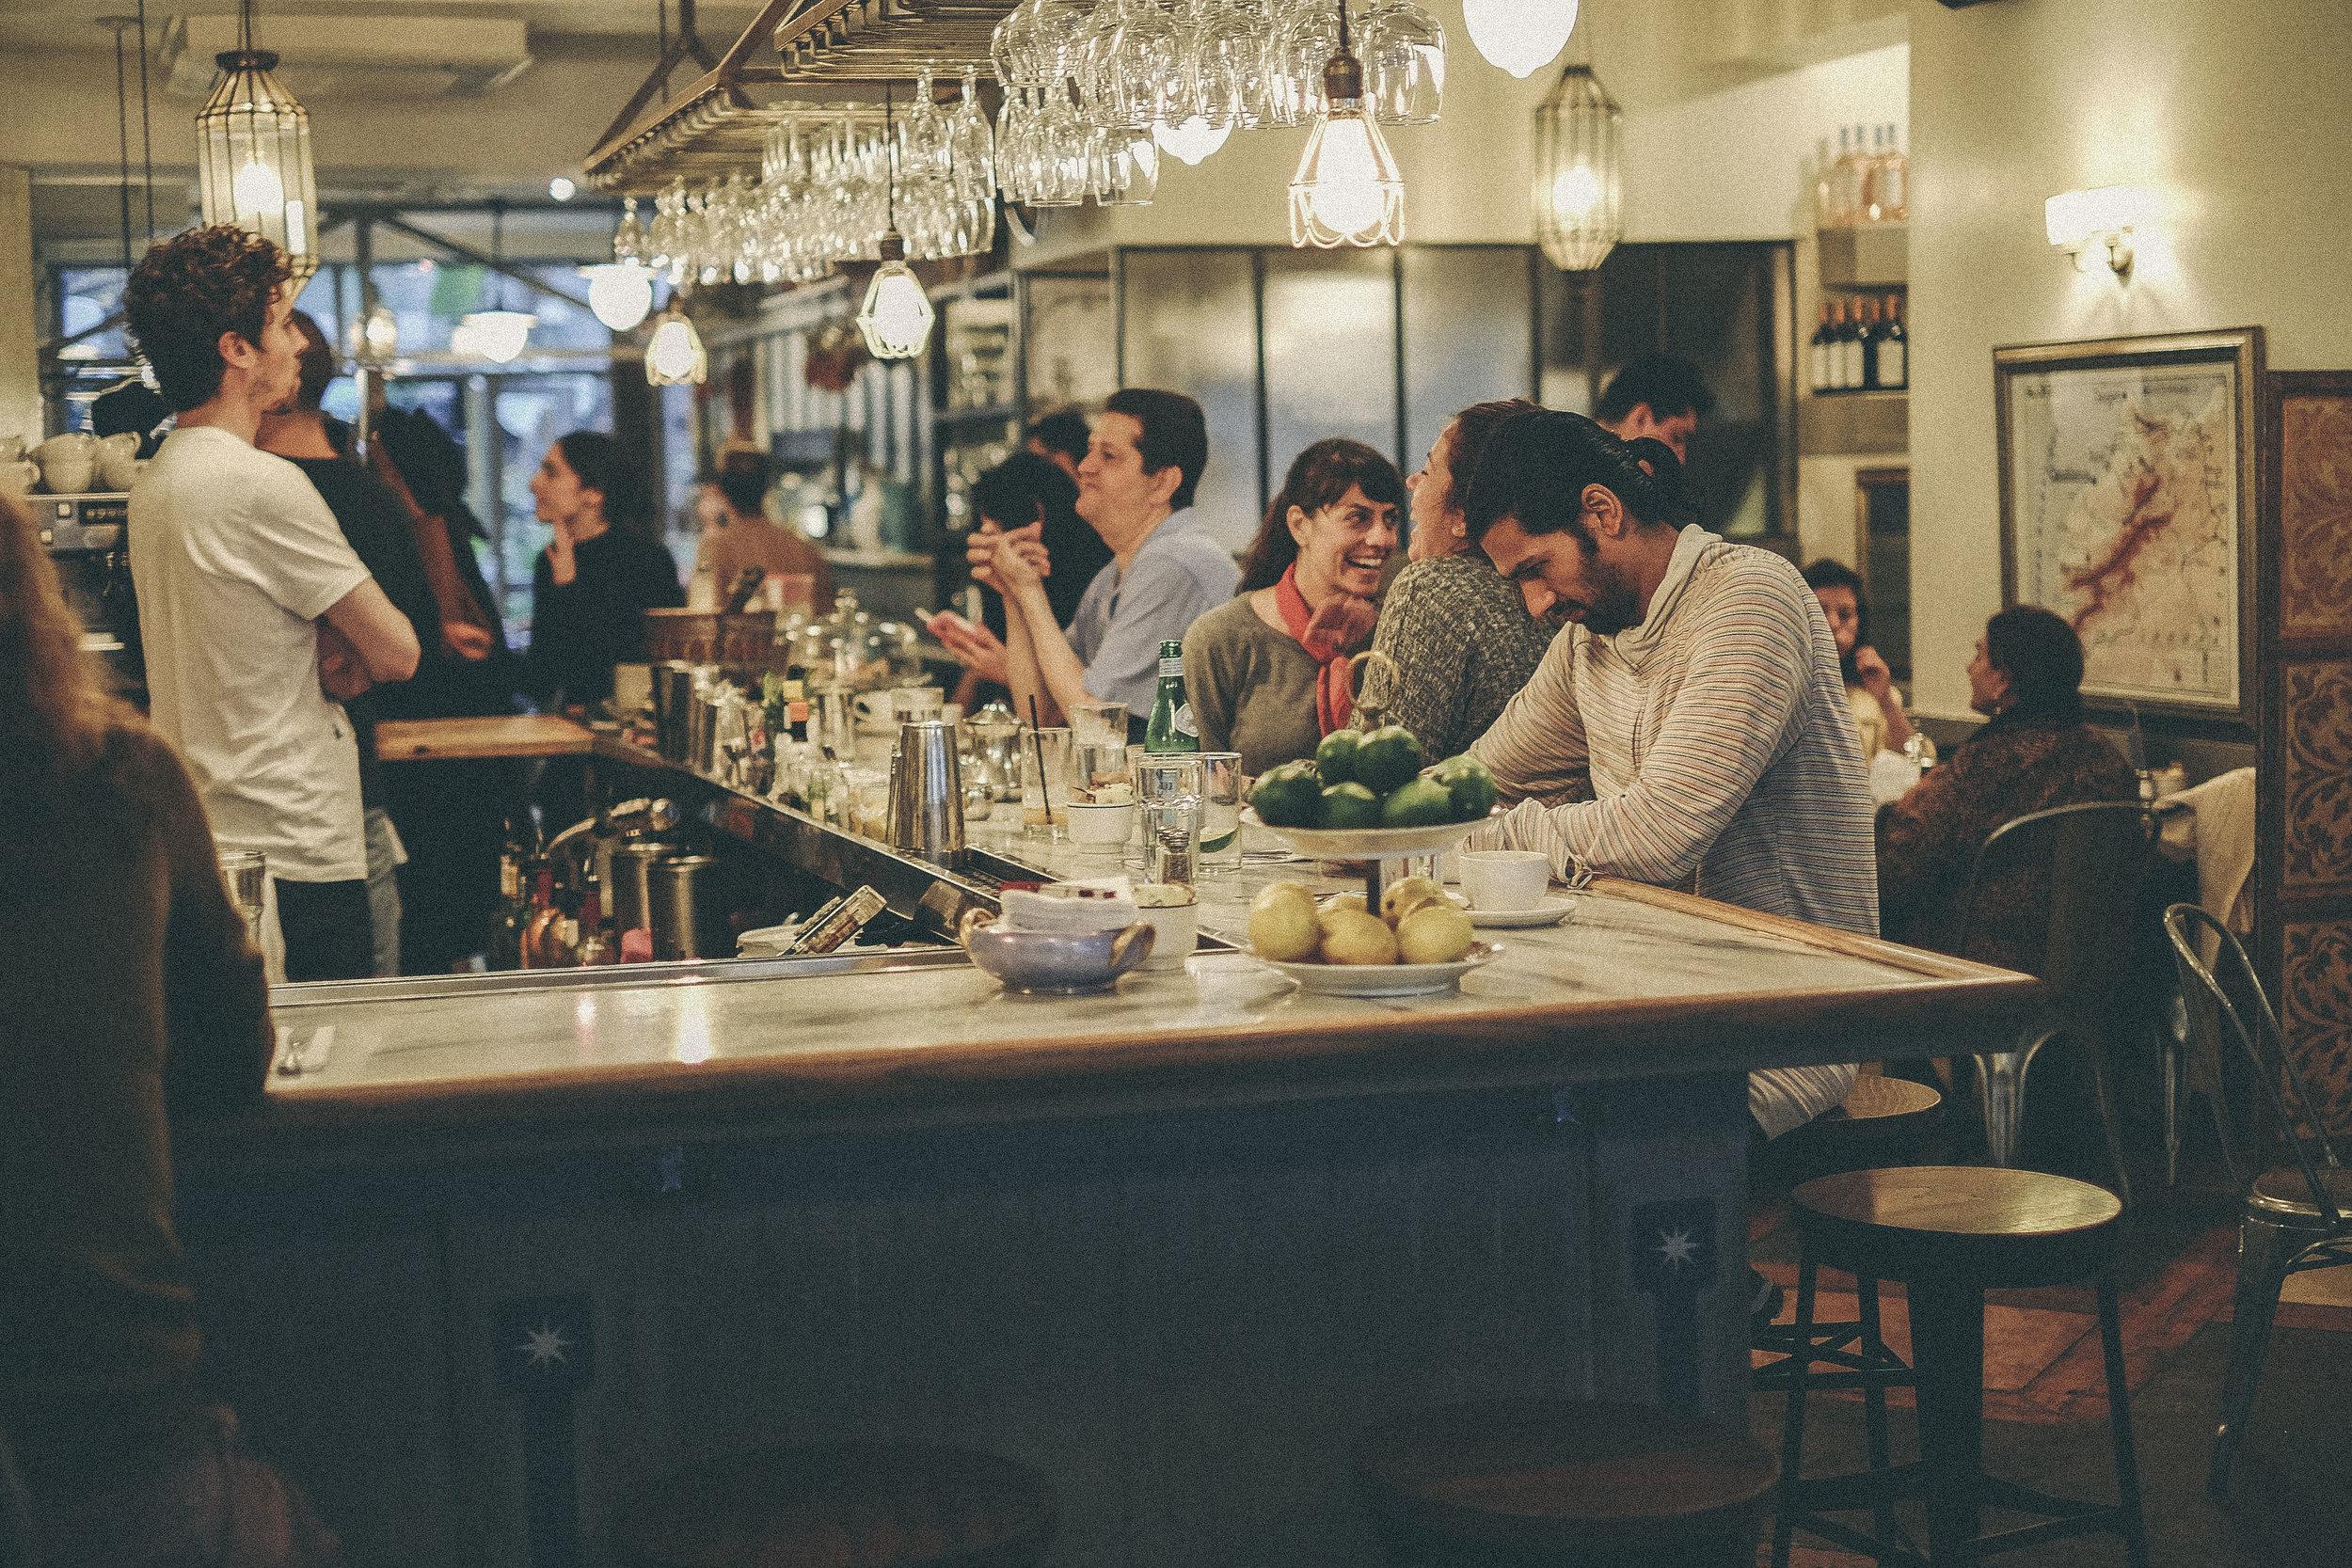 dérrive travel - CAFE MOGADOR, new york #cafemogador #katzsdeli #soho #dumbo #newyork #nyc #brooklyn